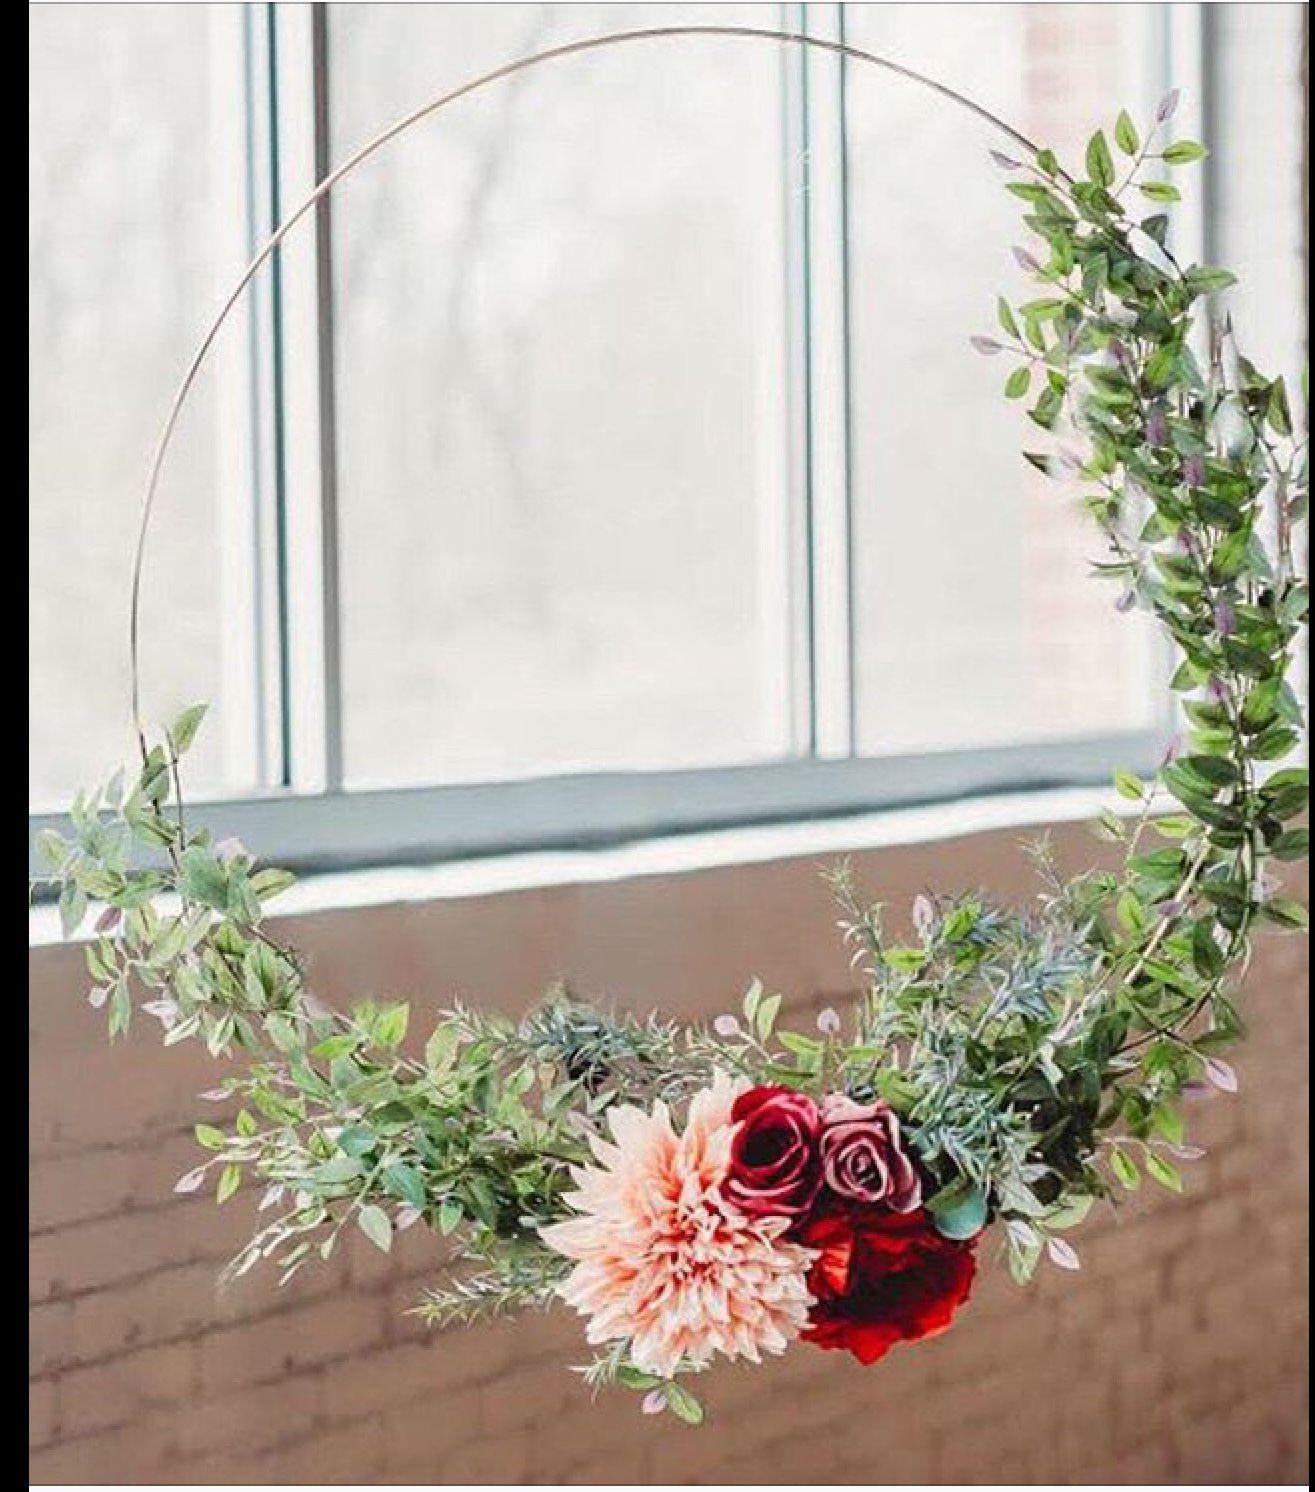 Eucalyptus Roses Dahlia Greenery 18 Gold Metal Ring Diy Wedding Backdrop Wedding Decorations Wedding Backdrop